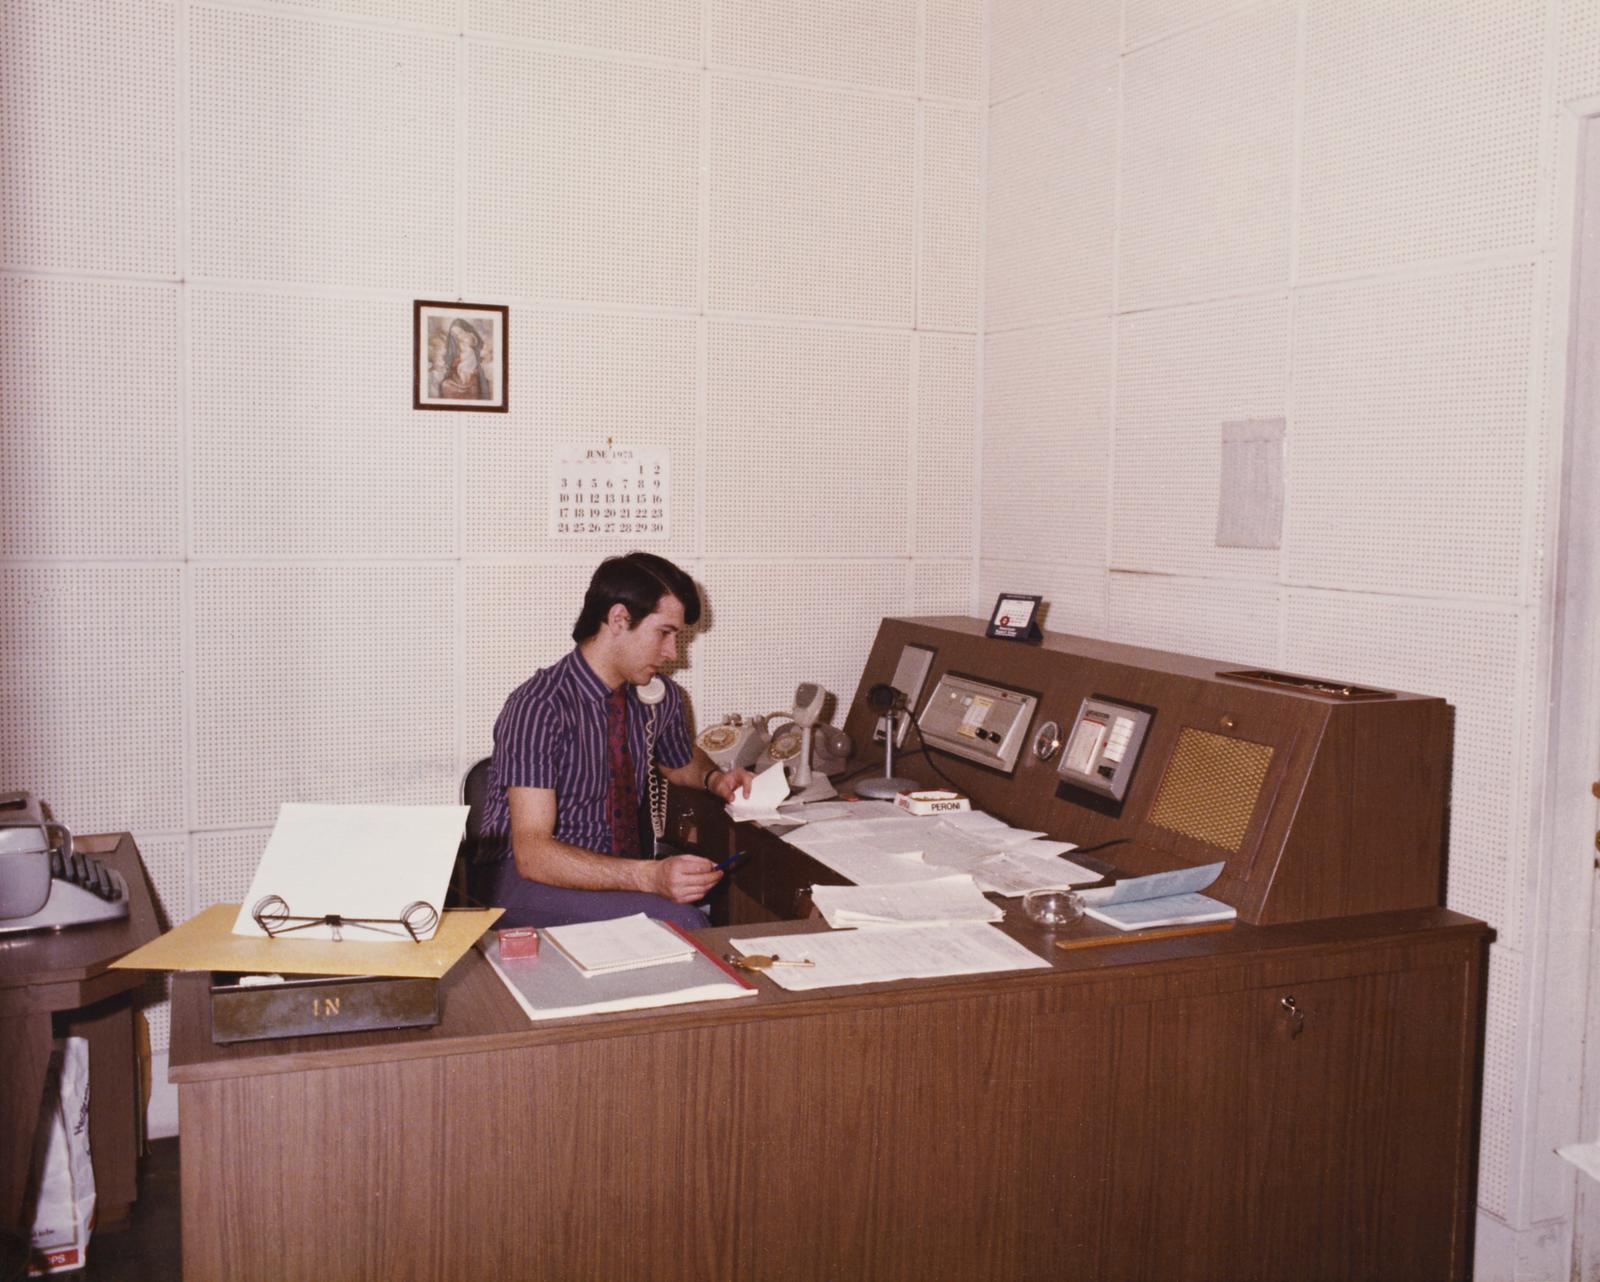 Rome - Annex Office Building - 1973